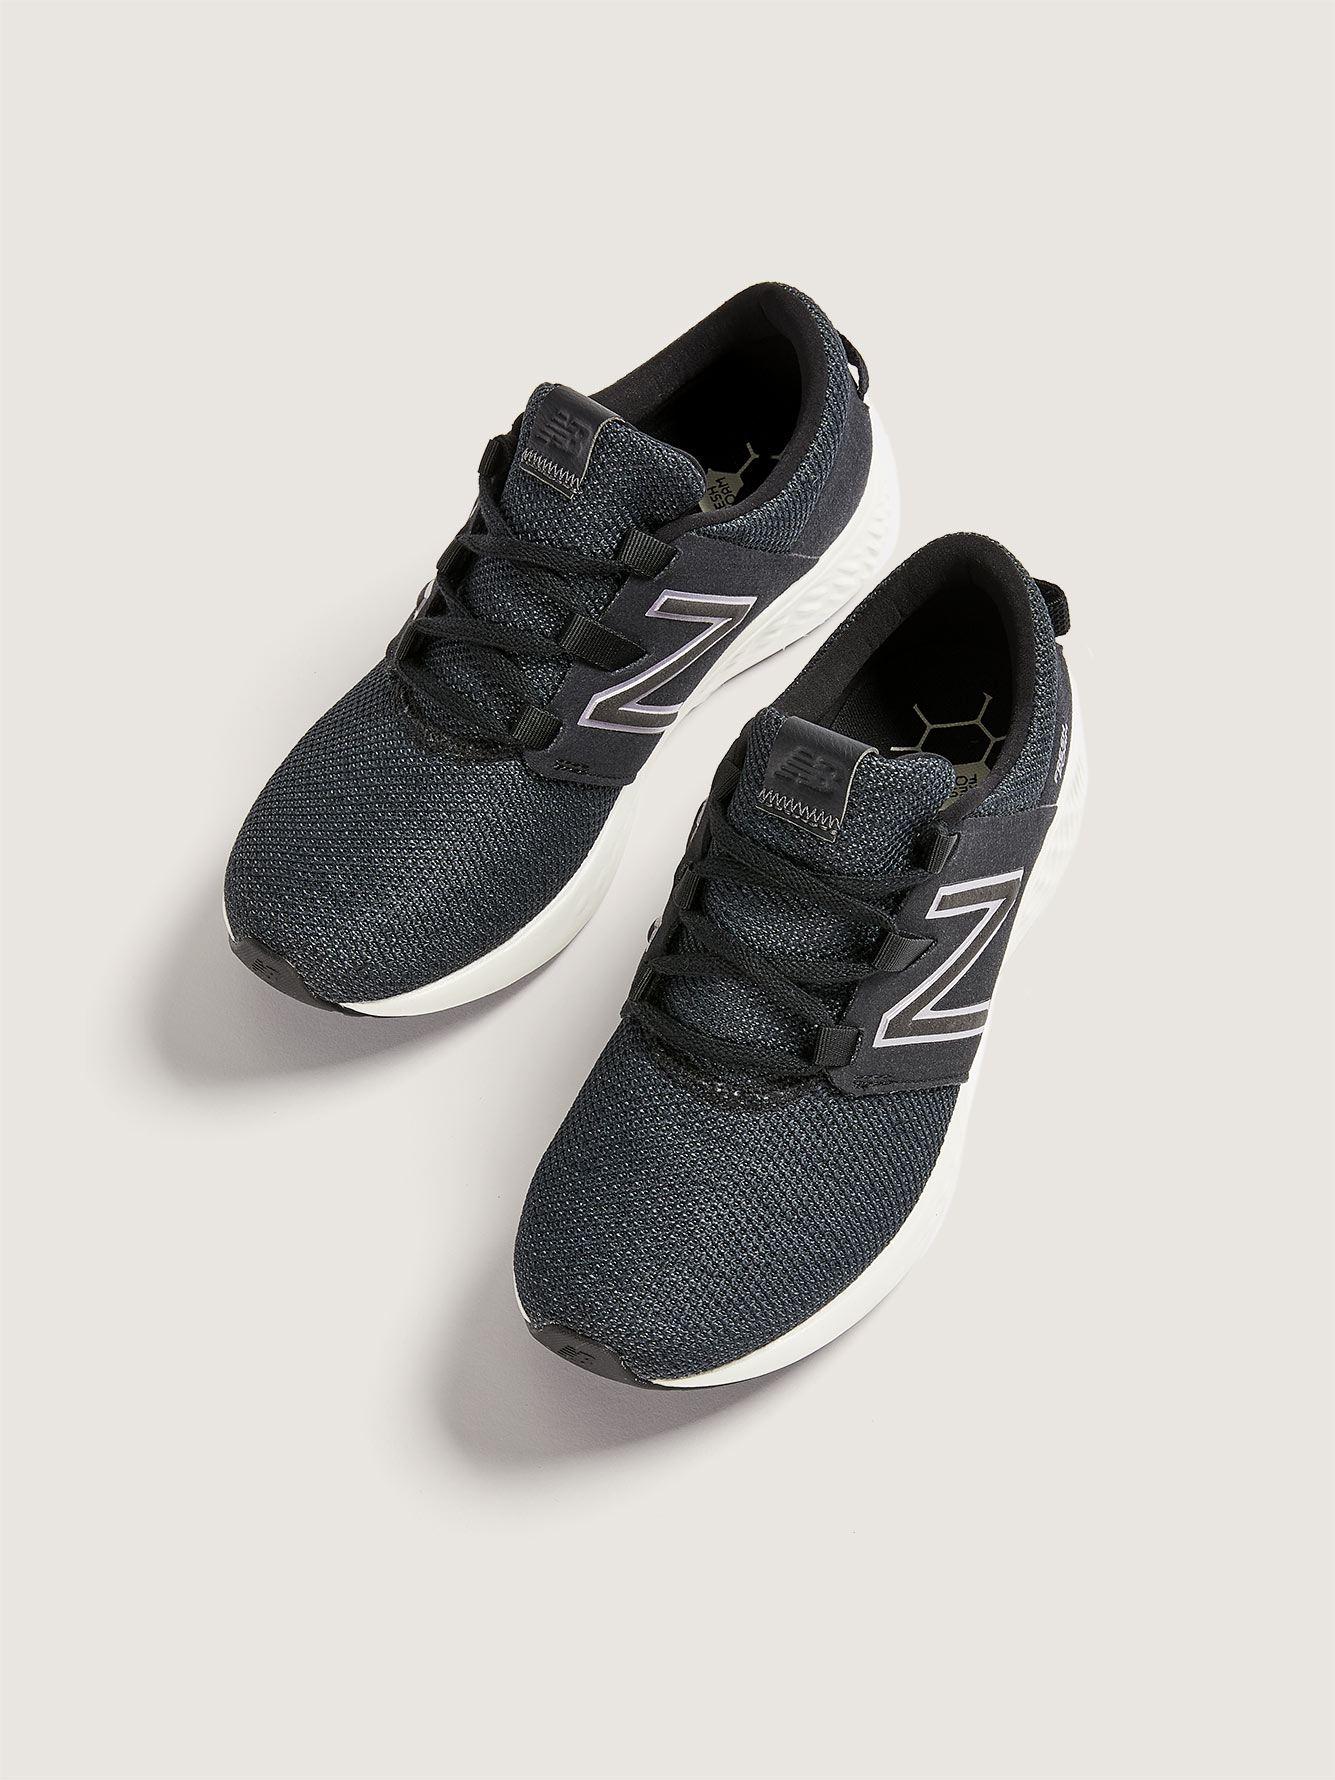 Wide Width Lightweight Vero Sport Sneakers - New Balance